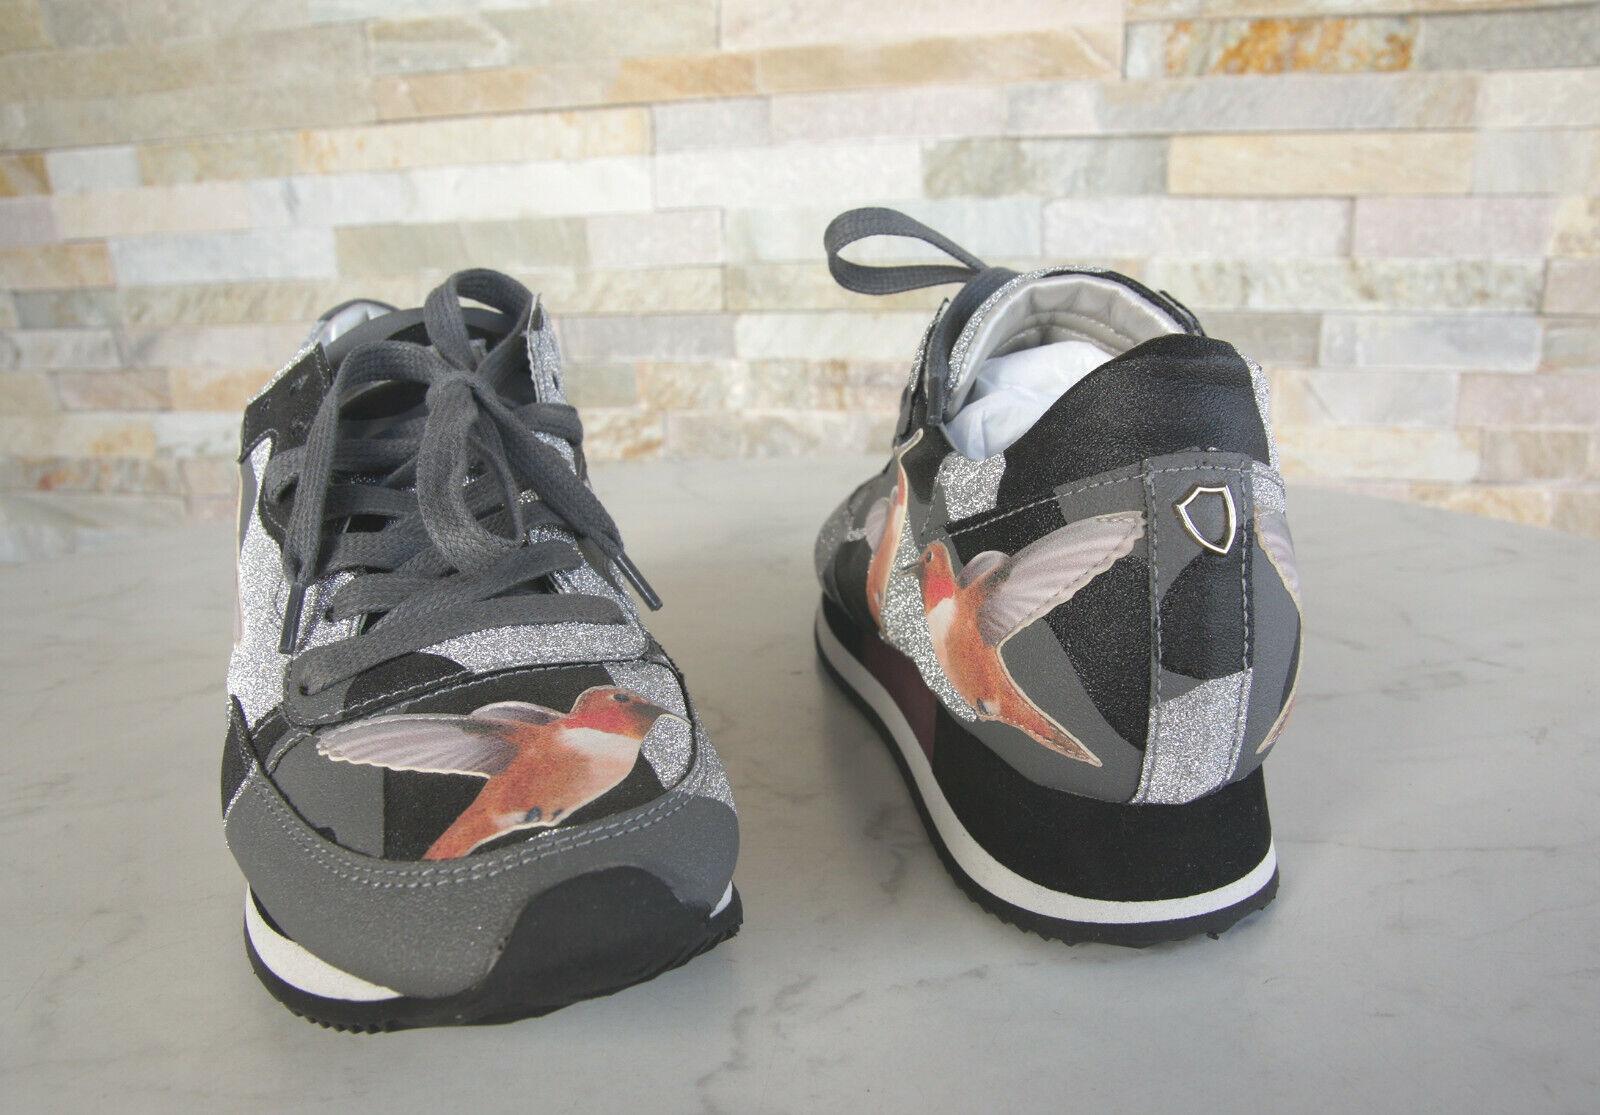 Philippe Model Paris Sz. 40 Sneakers Trainers Tbld shoes Etoile Etoile Etoile Grey New fe308d